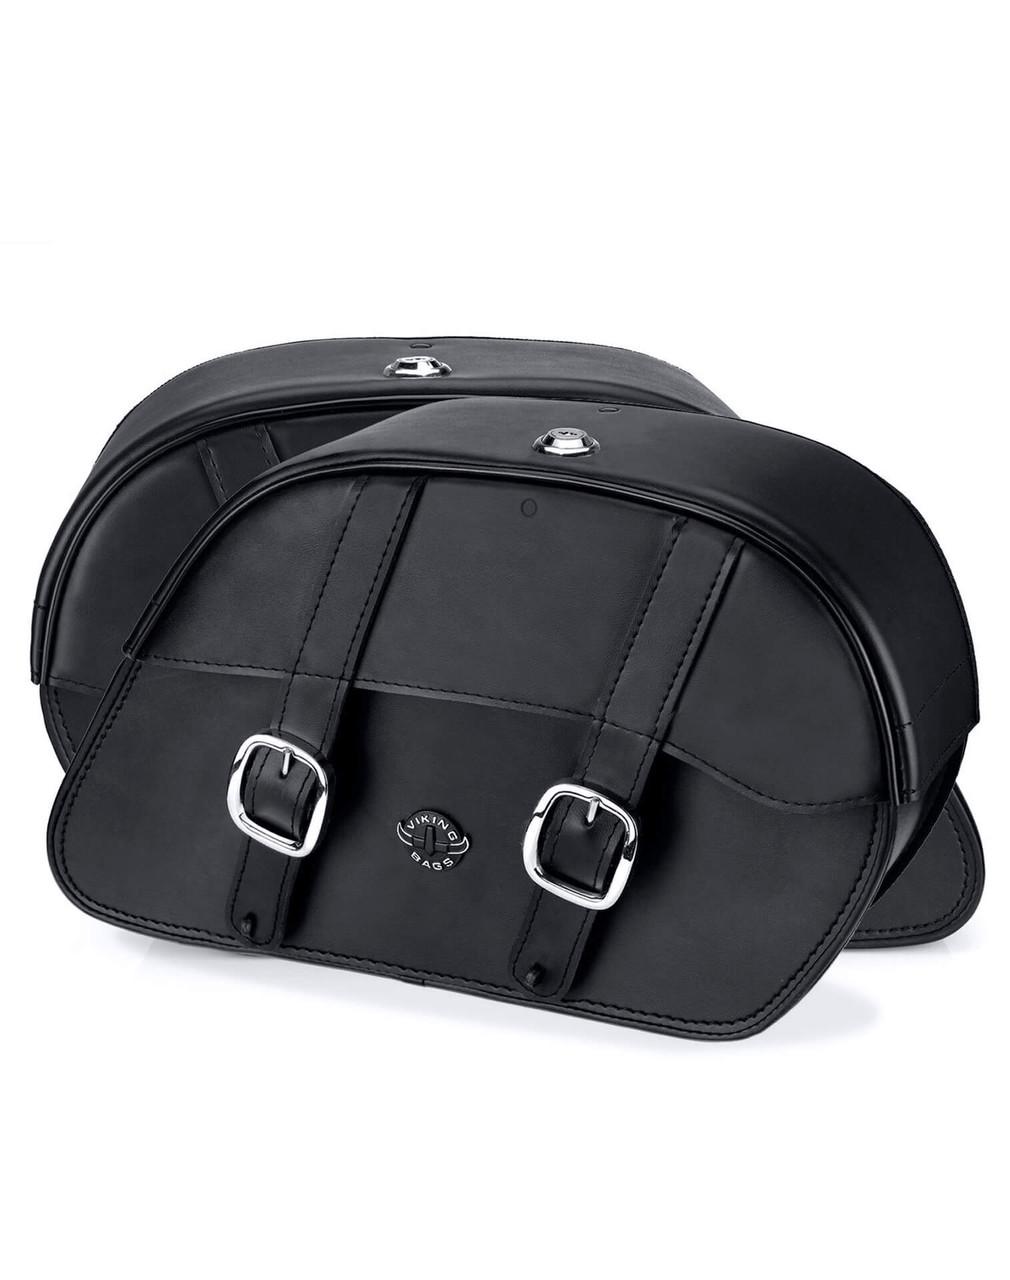 Honda CMX 250C Rebel 250 Shock Cutout Slanted Large Motorcycle Saddlebags Both Bags View